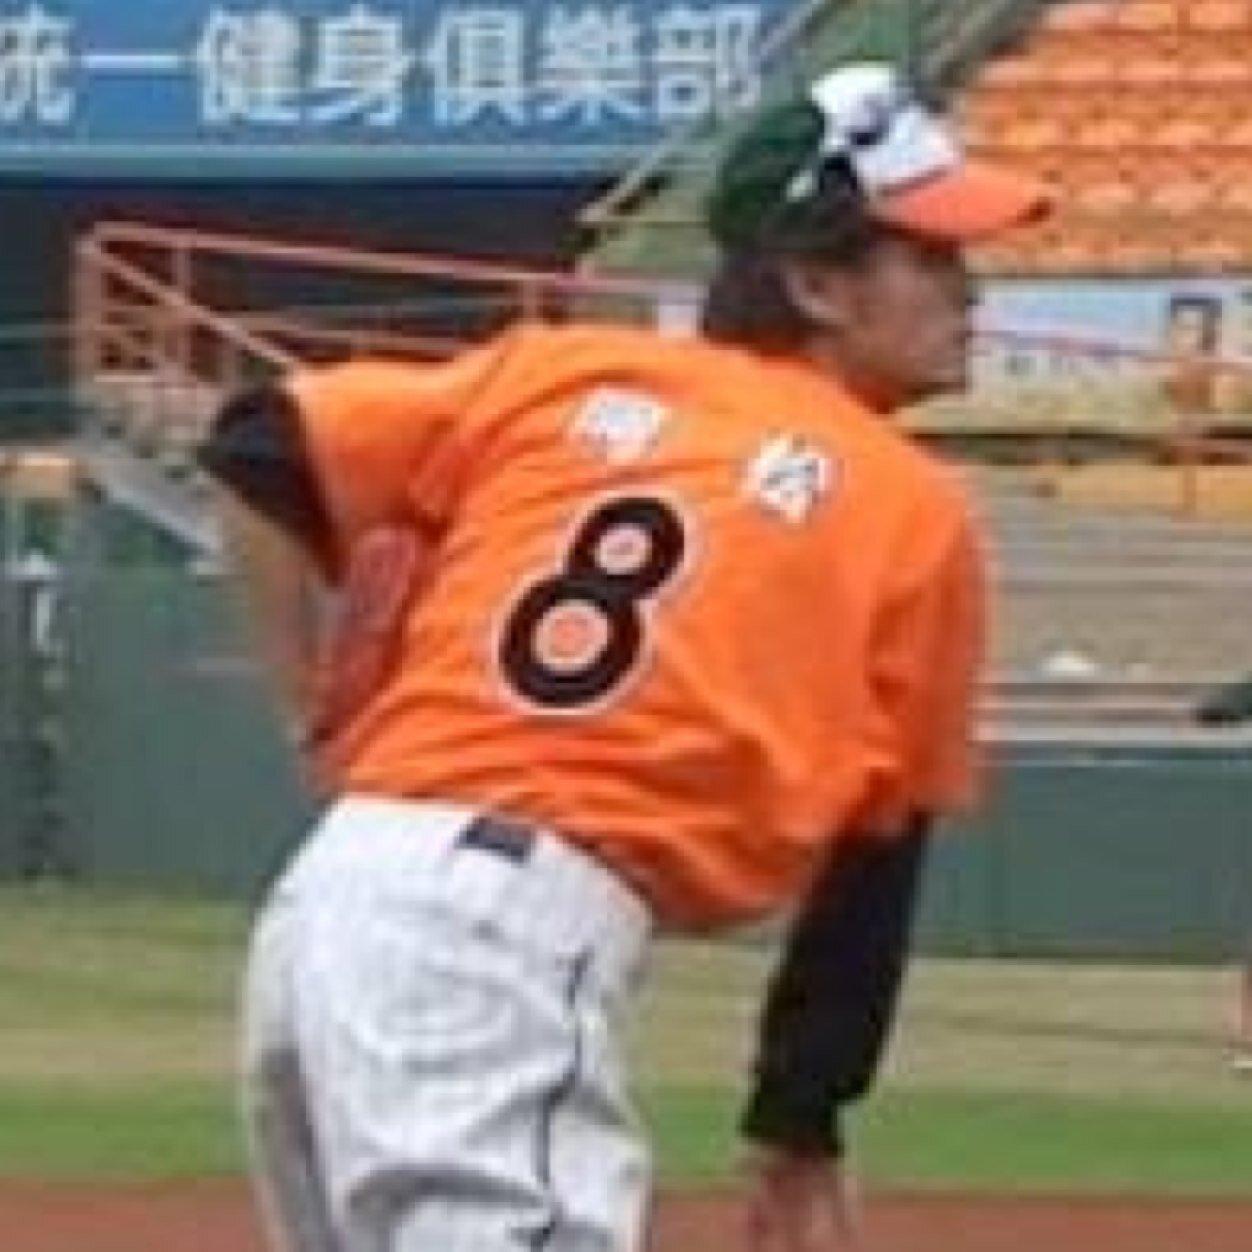 MATSU/阿松美食網/大口吃遍台灣 Social Profile